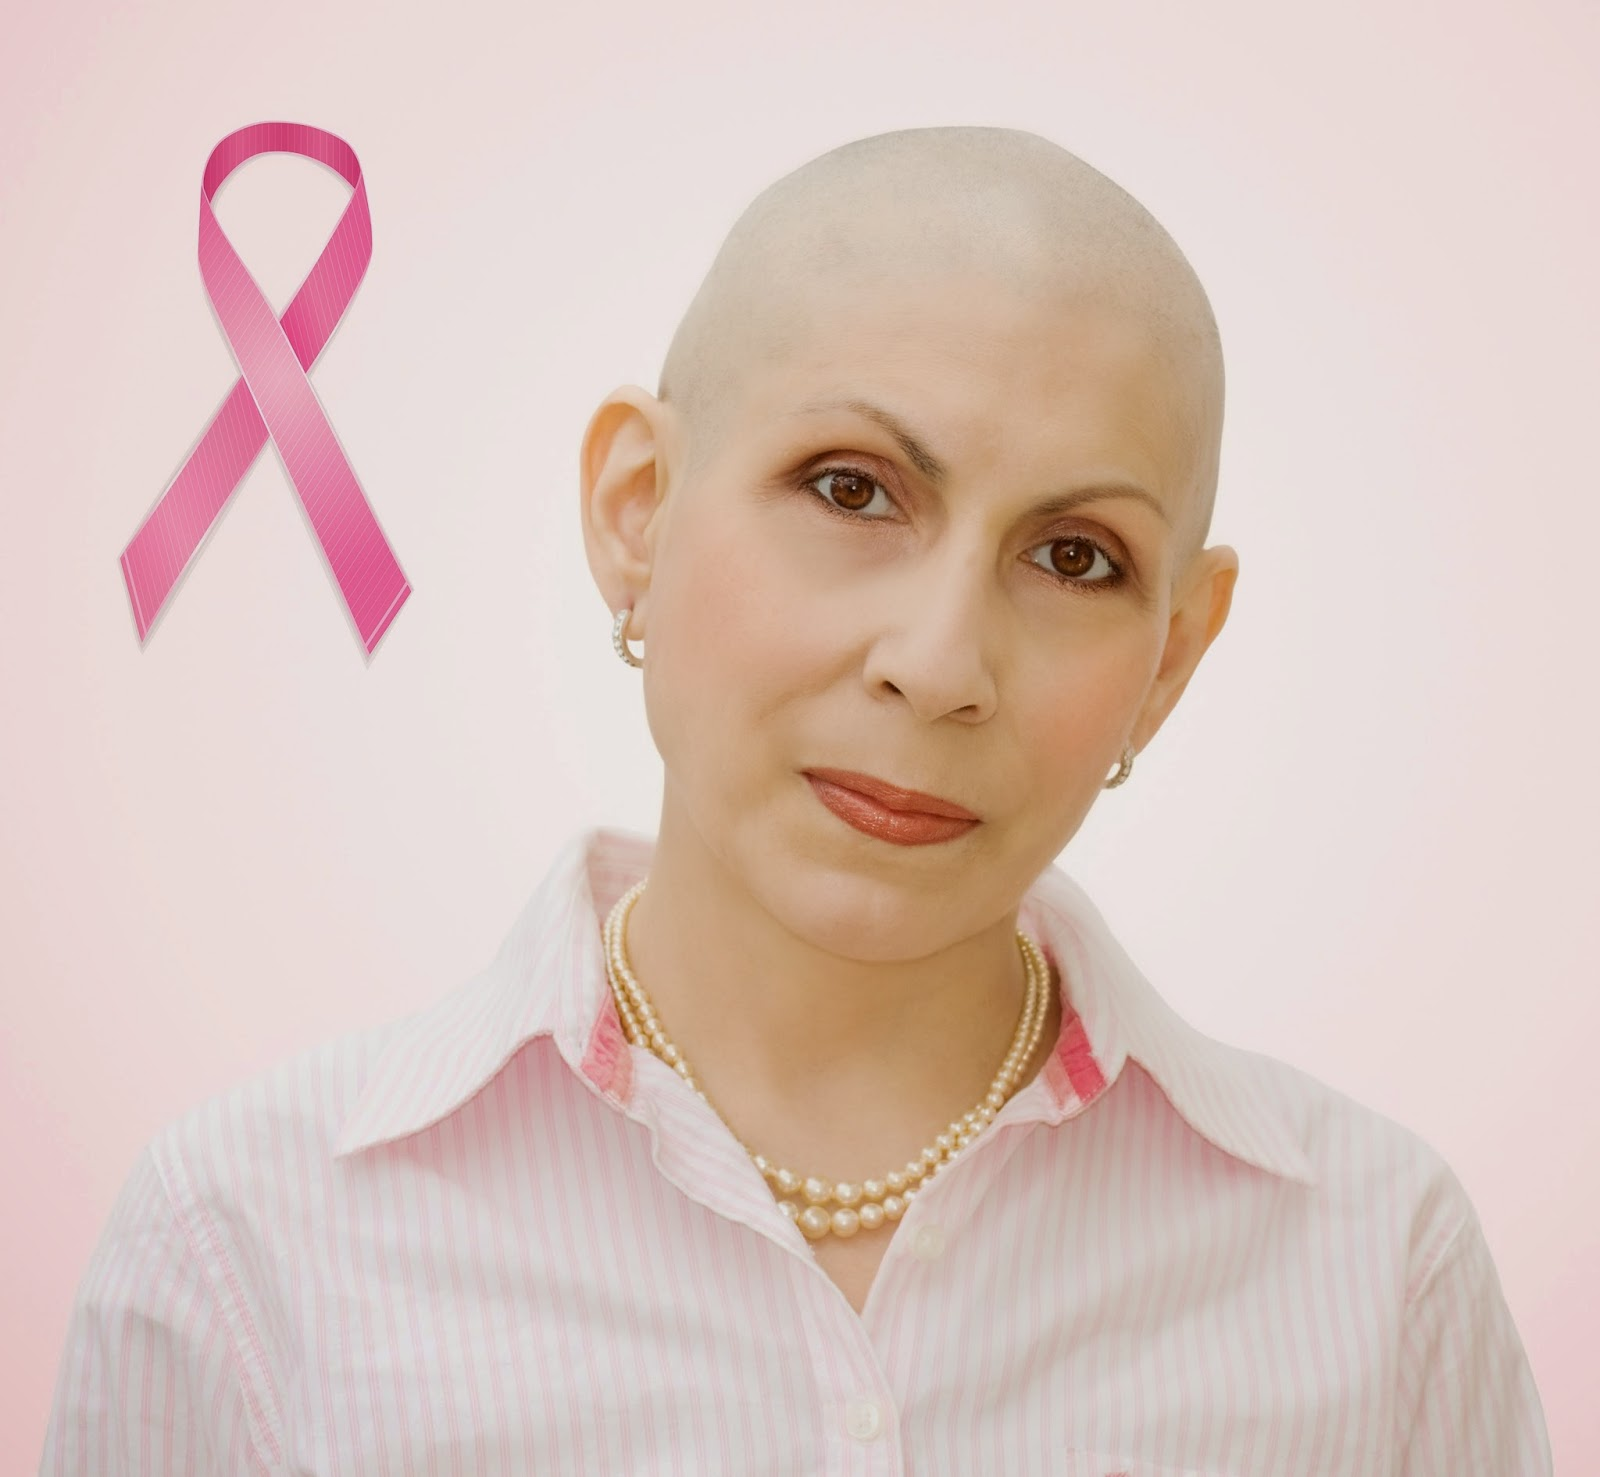 Coffee estrogen breast cancer